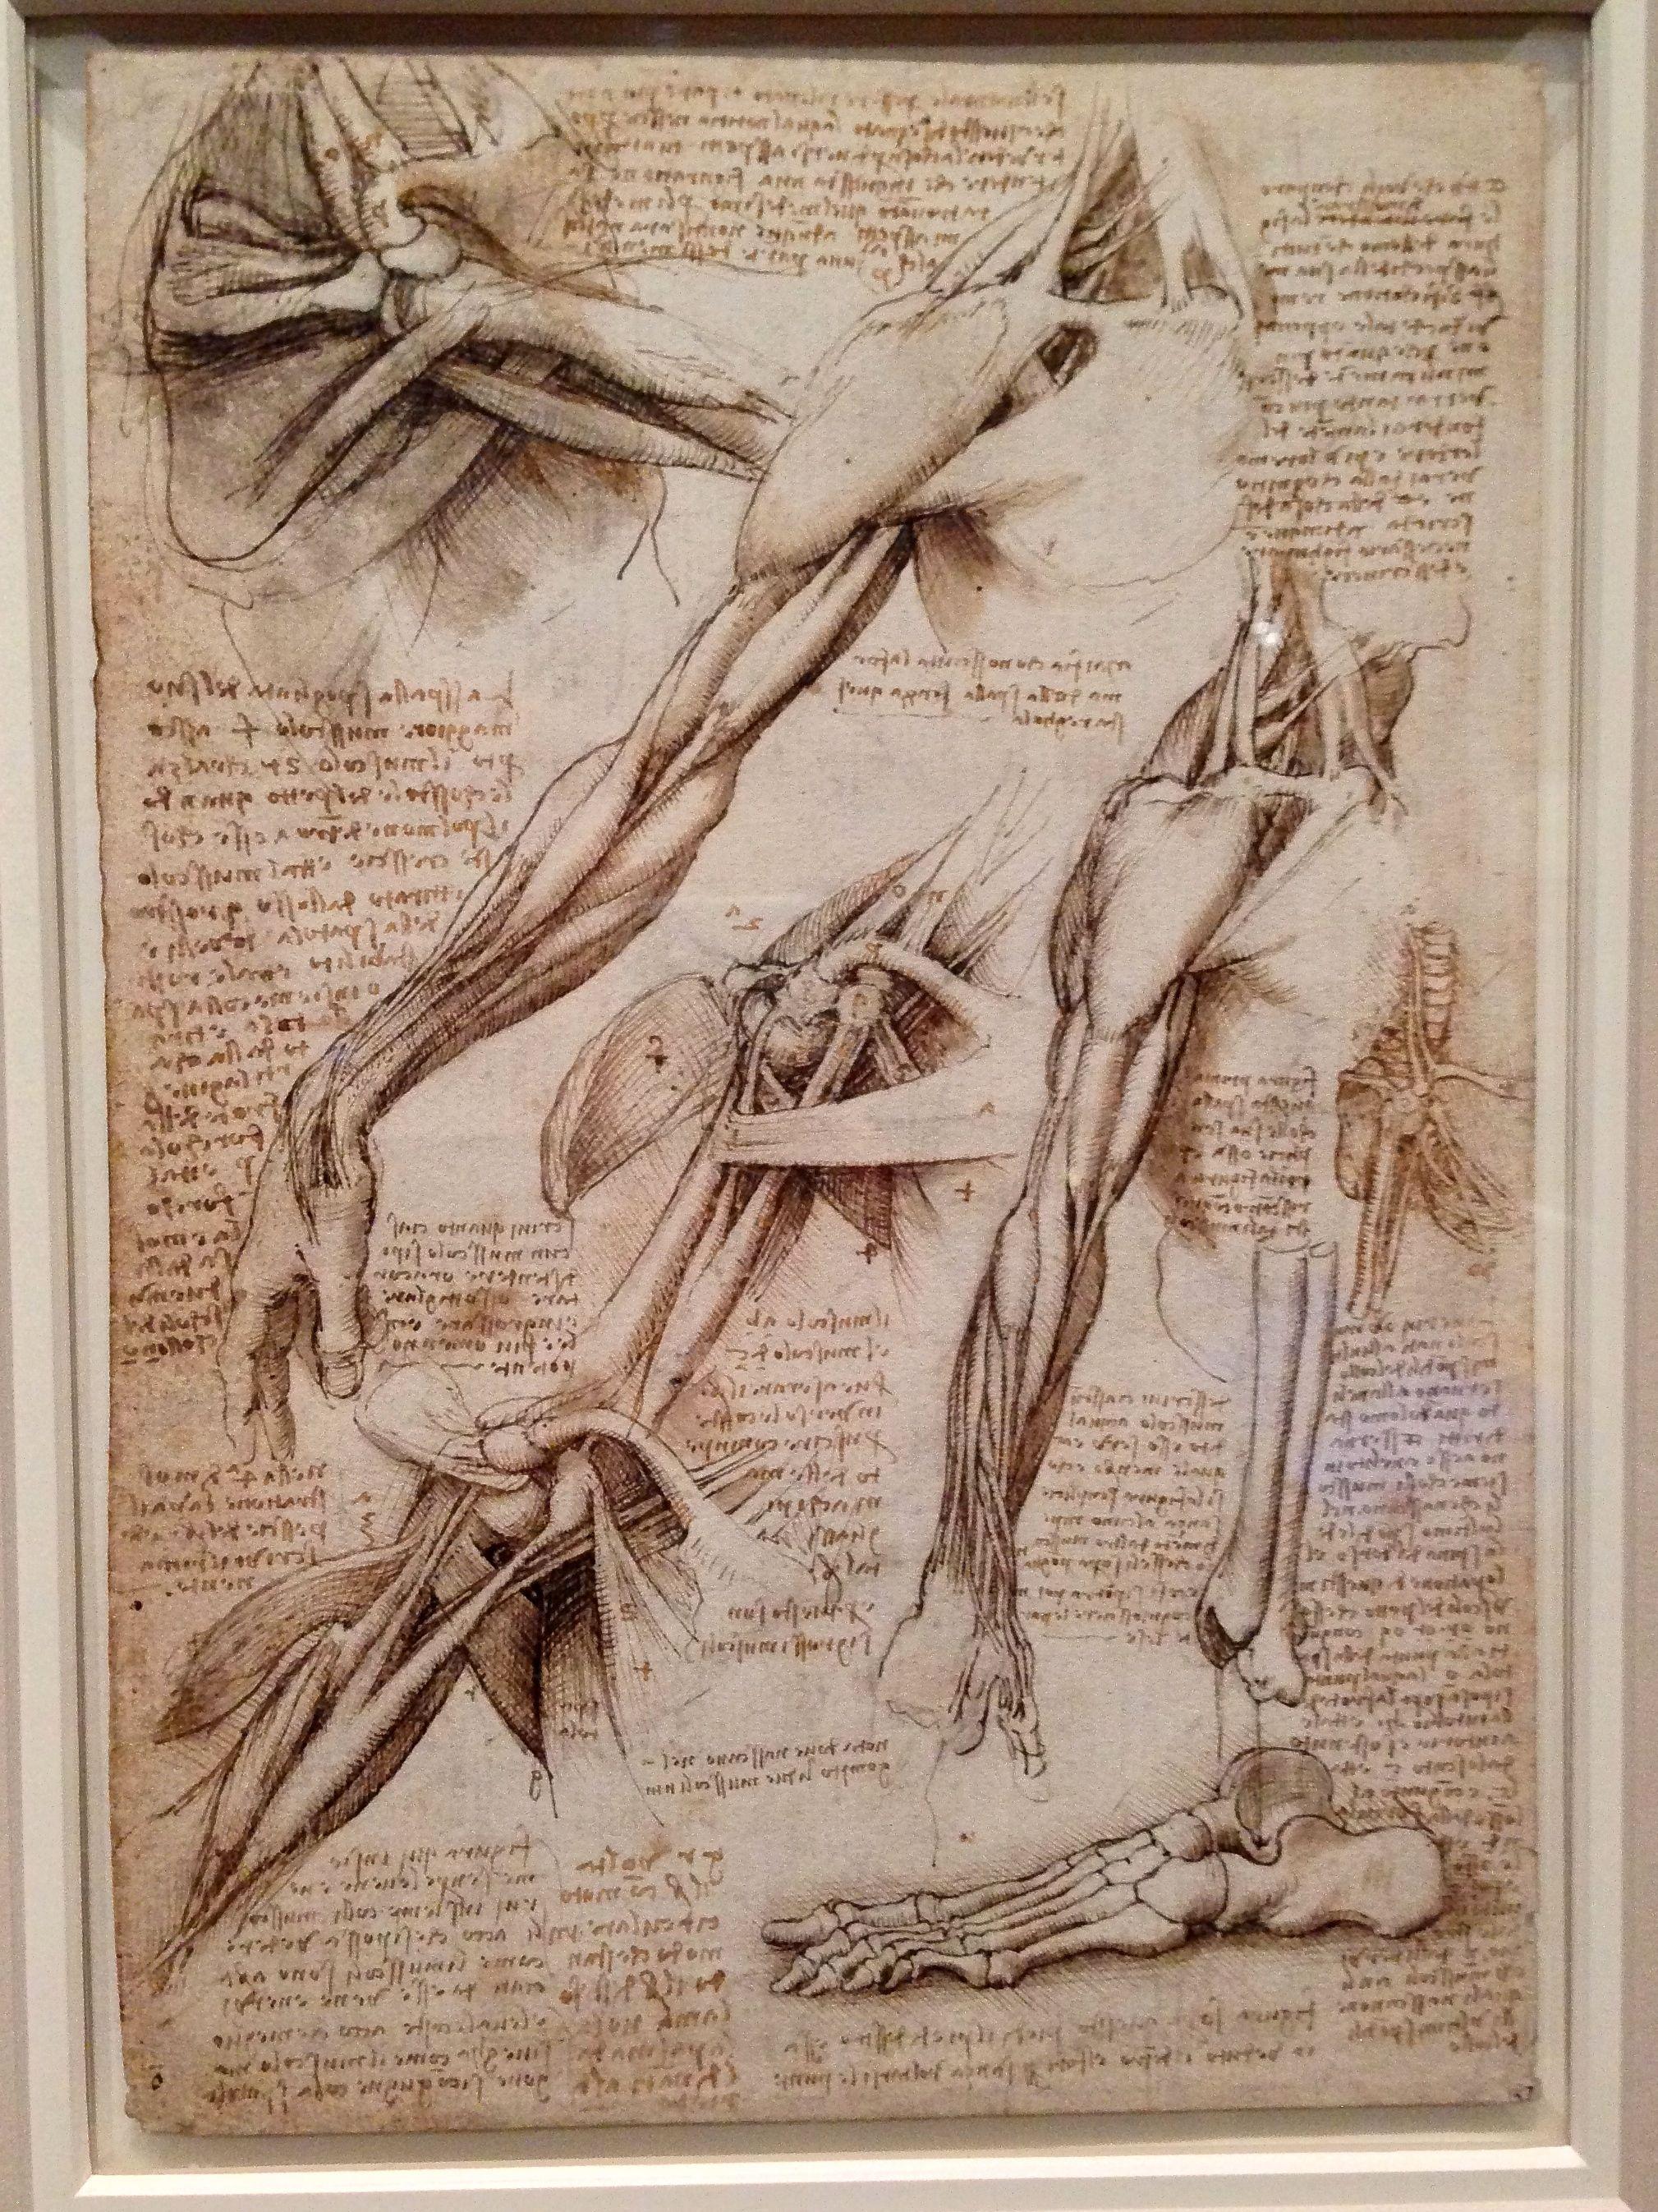 Da Vinci | art | Pinterest | Drawings